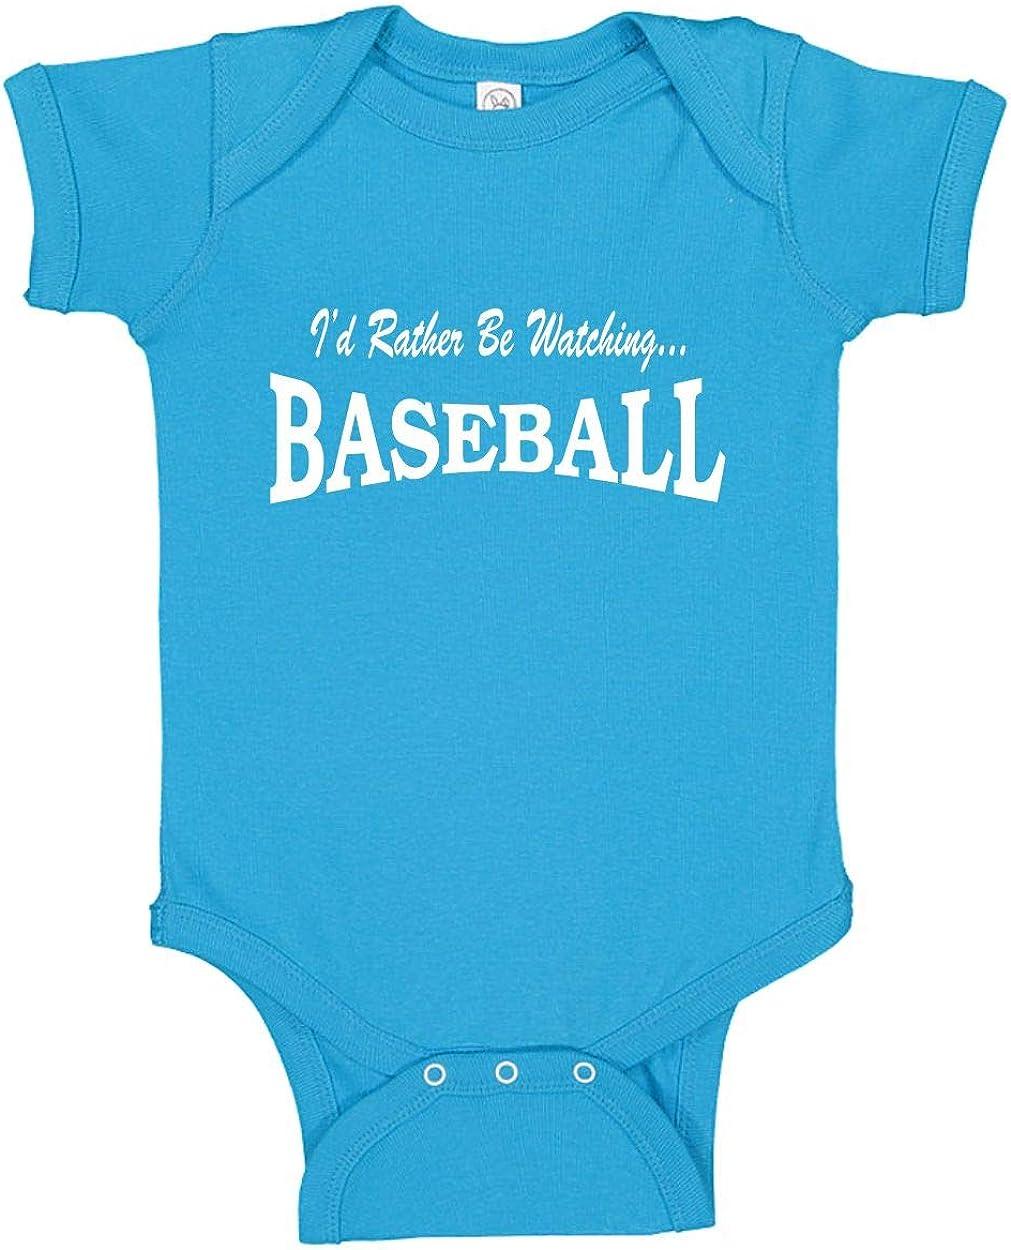 Id Rather be Watching Baseball Unisex Baby Bodysuit T-Shirt